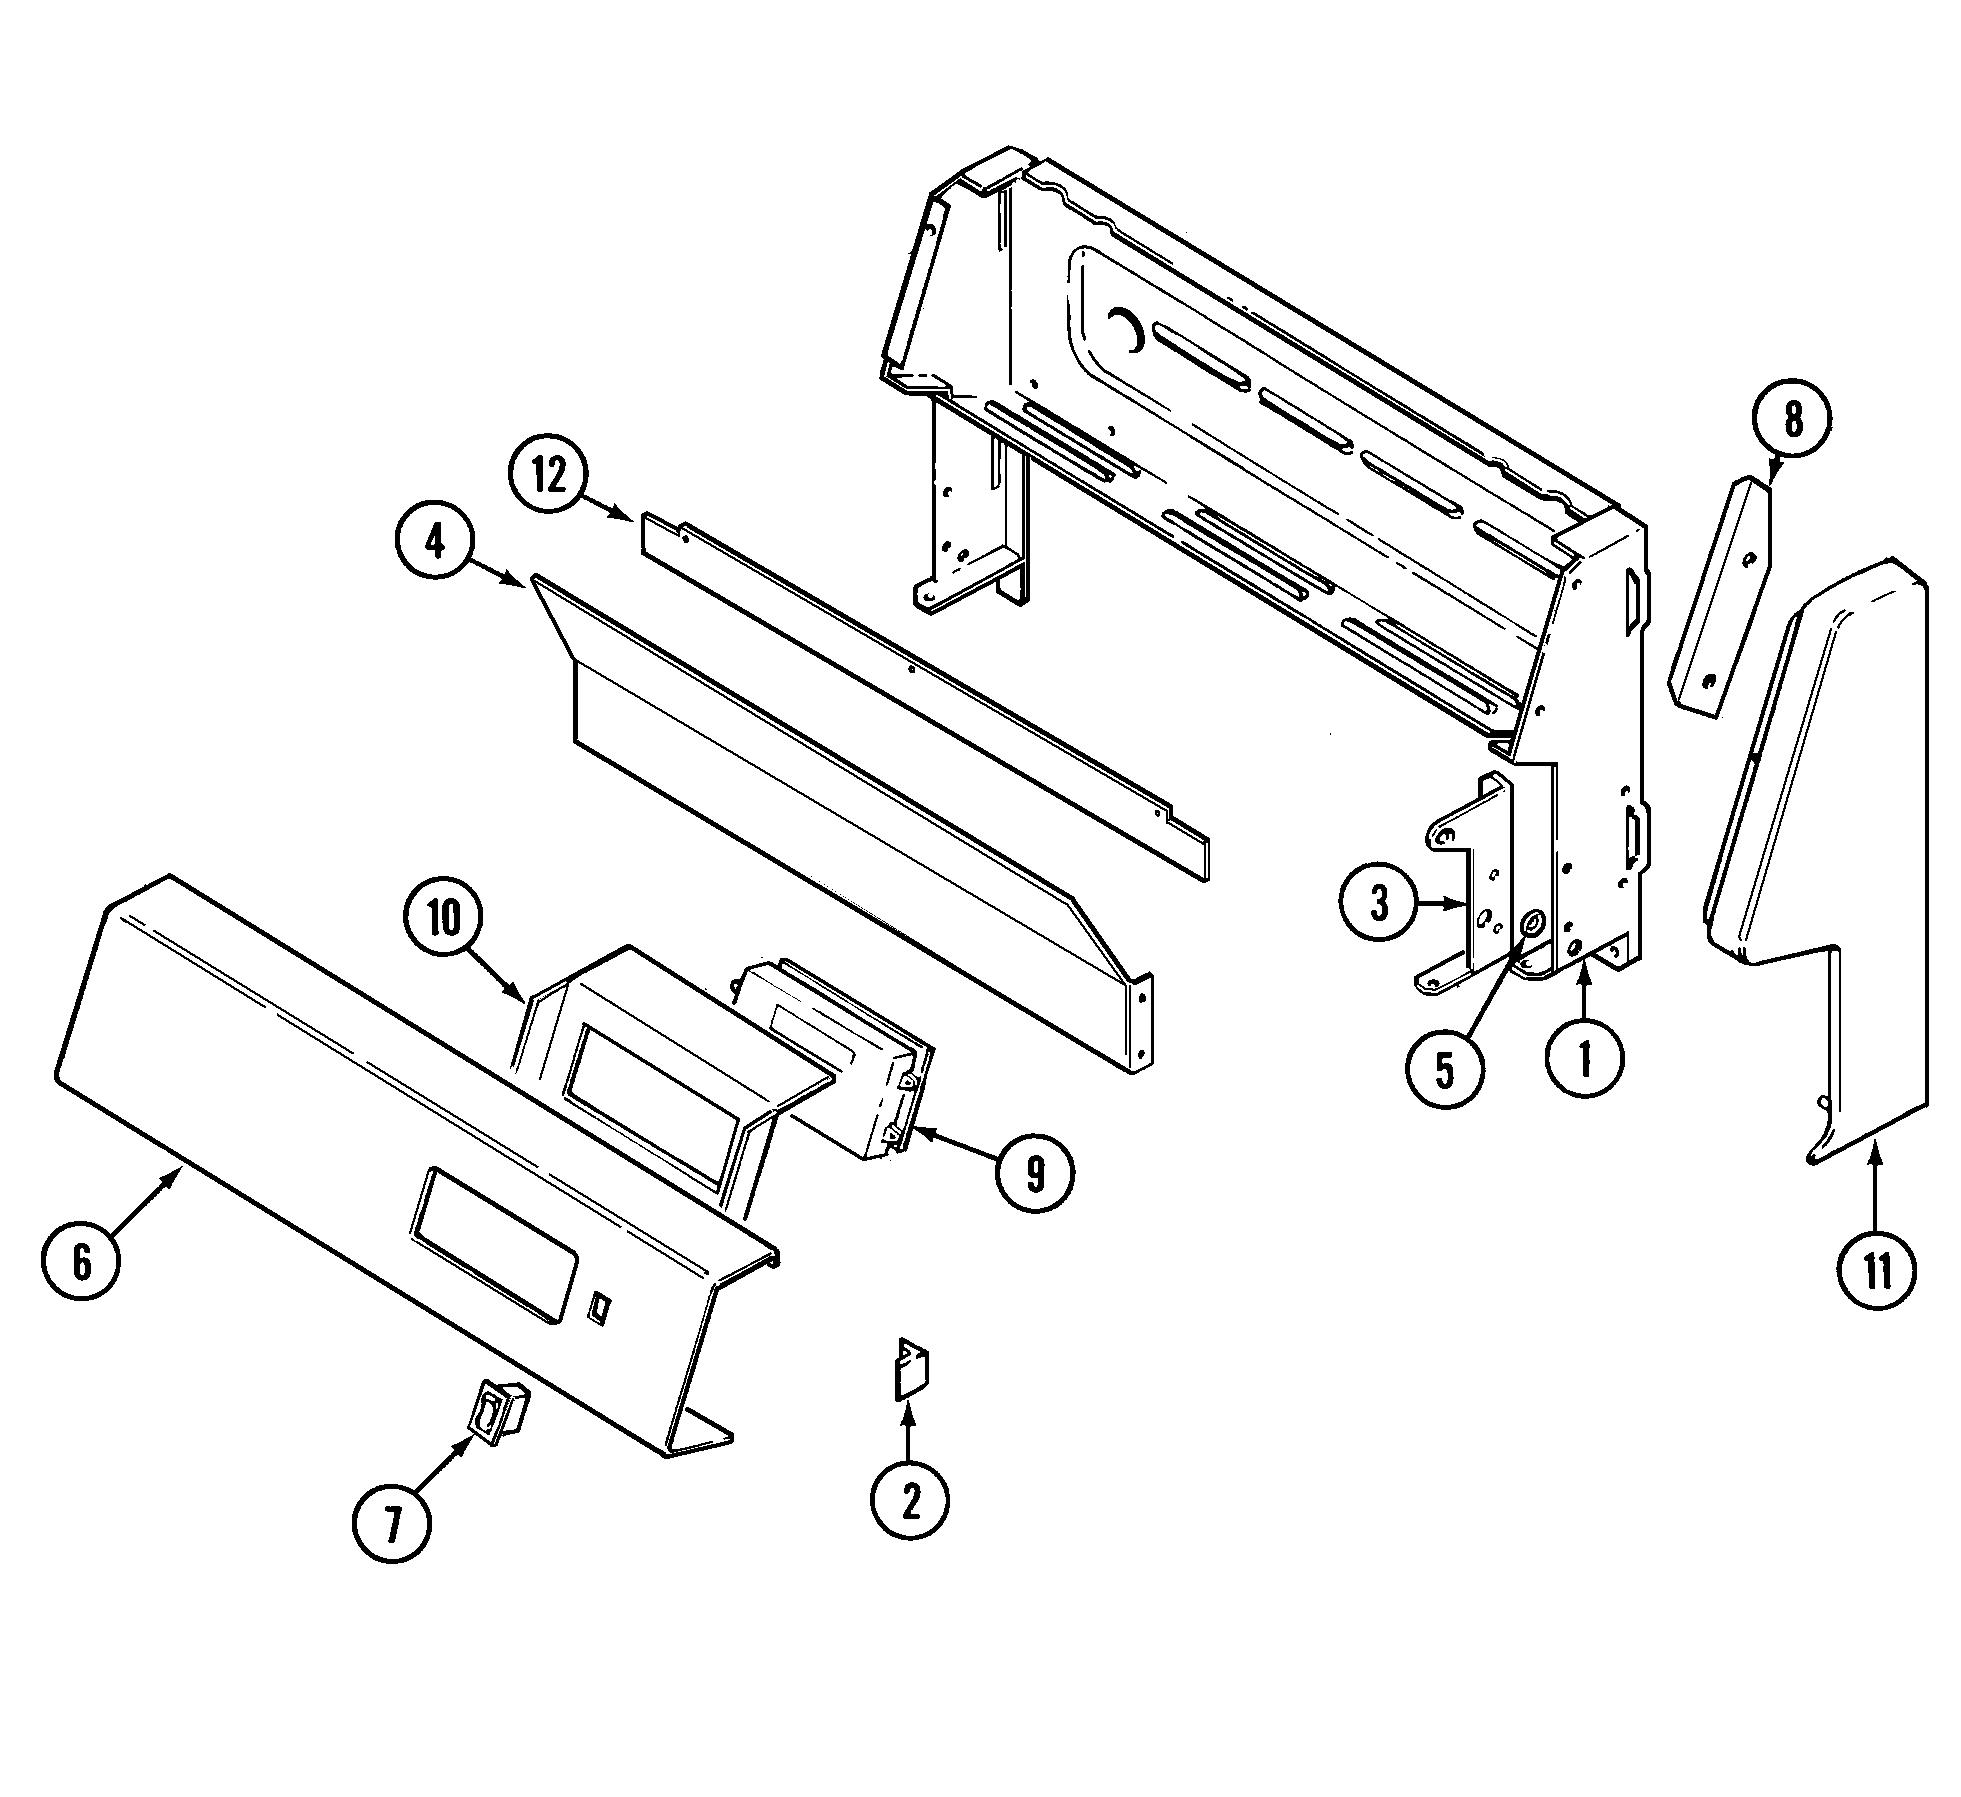 hight resolution of crg9700cae range control panel parts diagram wiring information parts diagram